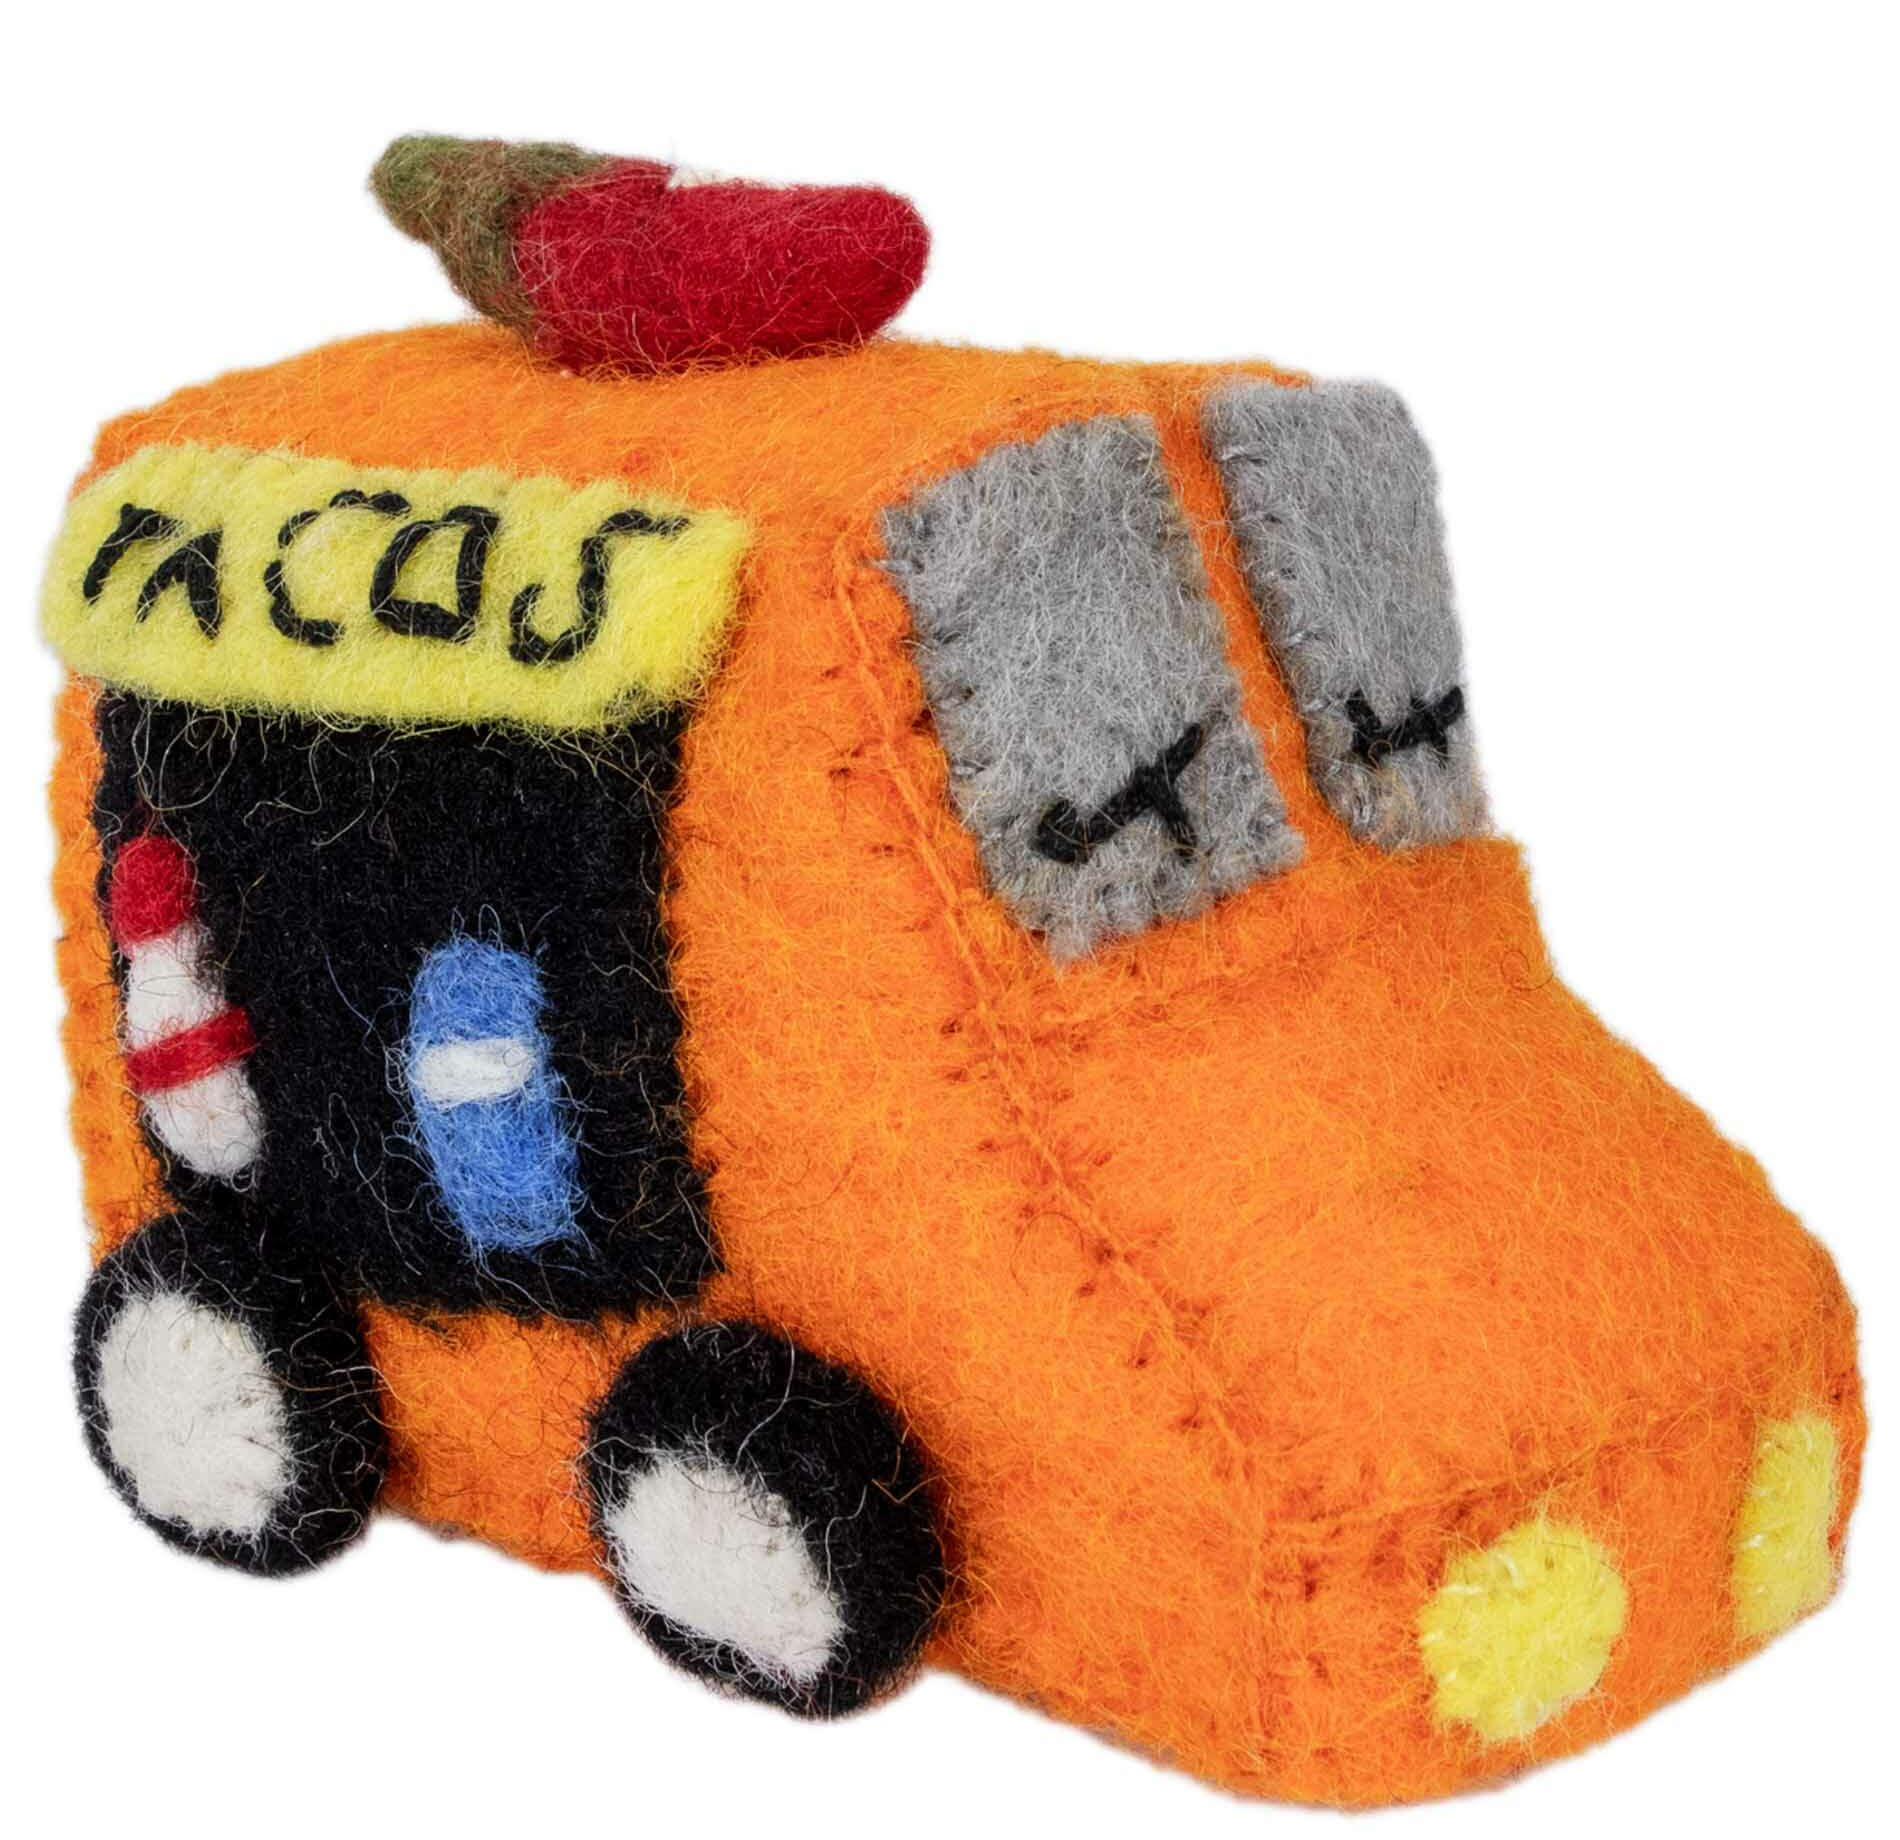 The Holiday Aisle Handmade Felt Taco Truck Hanging Figurine Ornament Wayfair